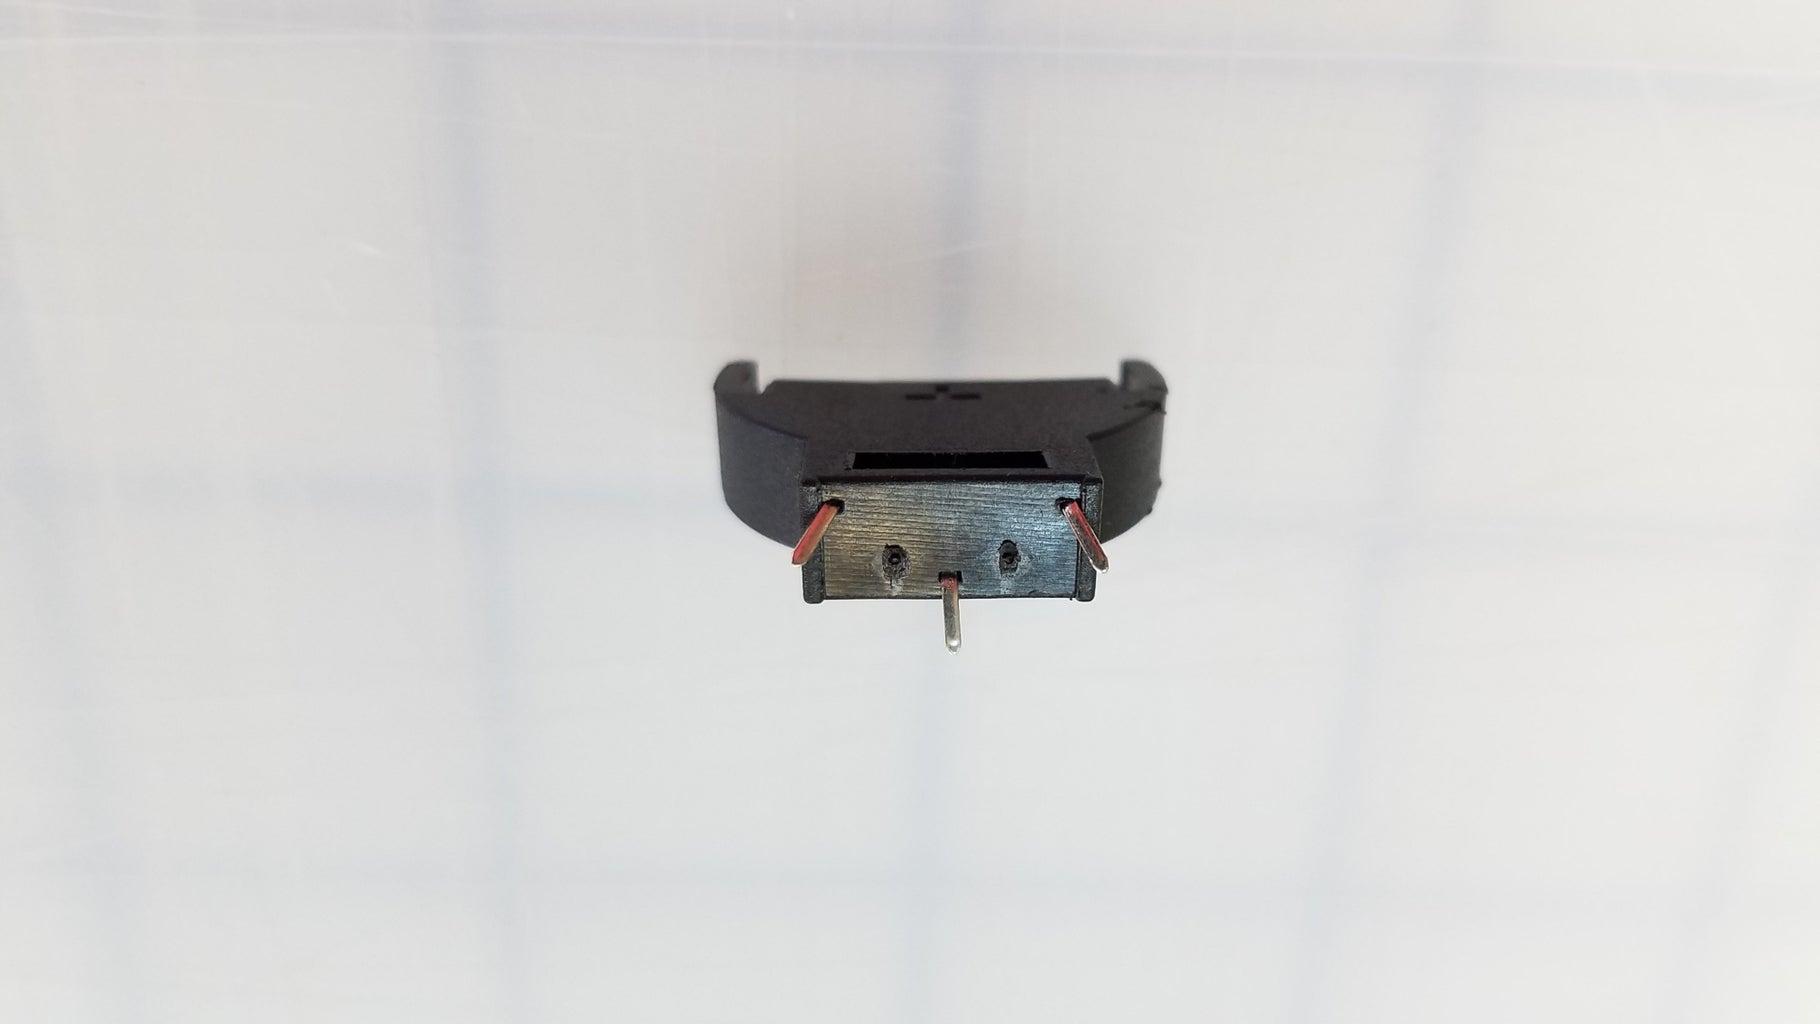 Soldering the Resistor